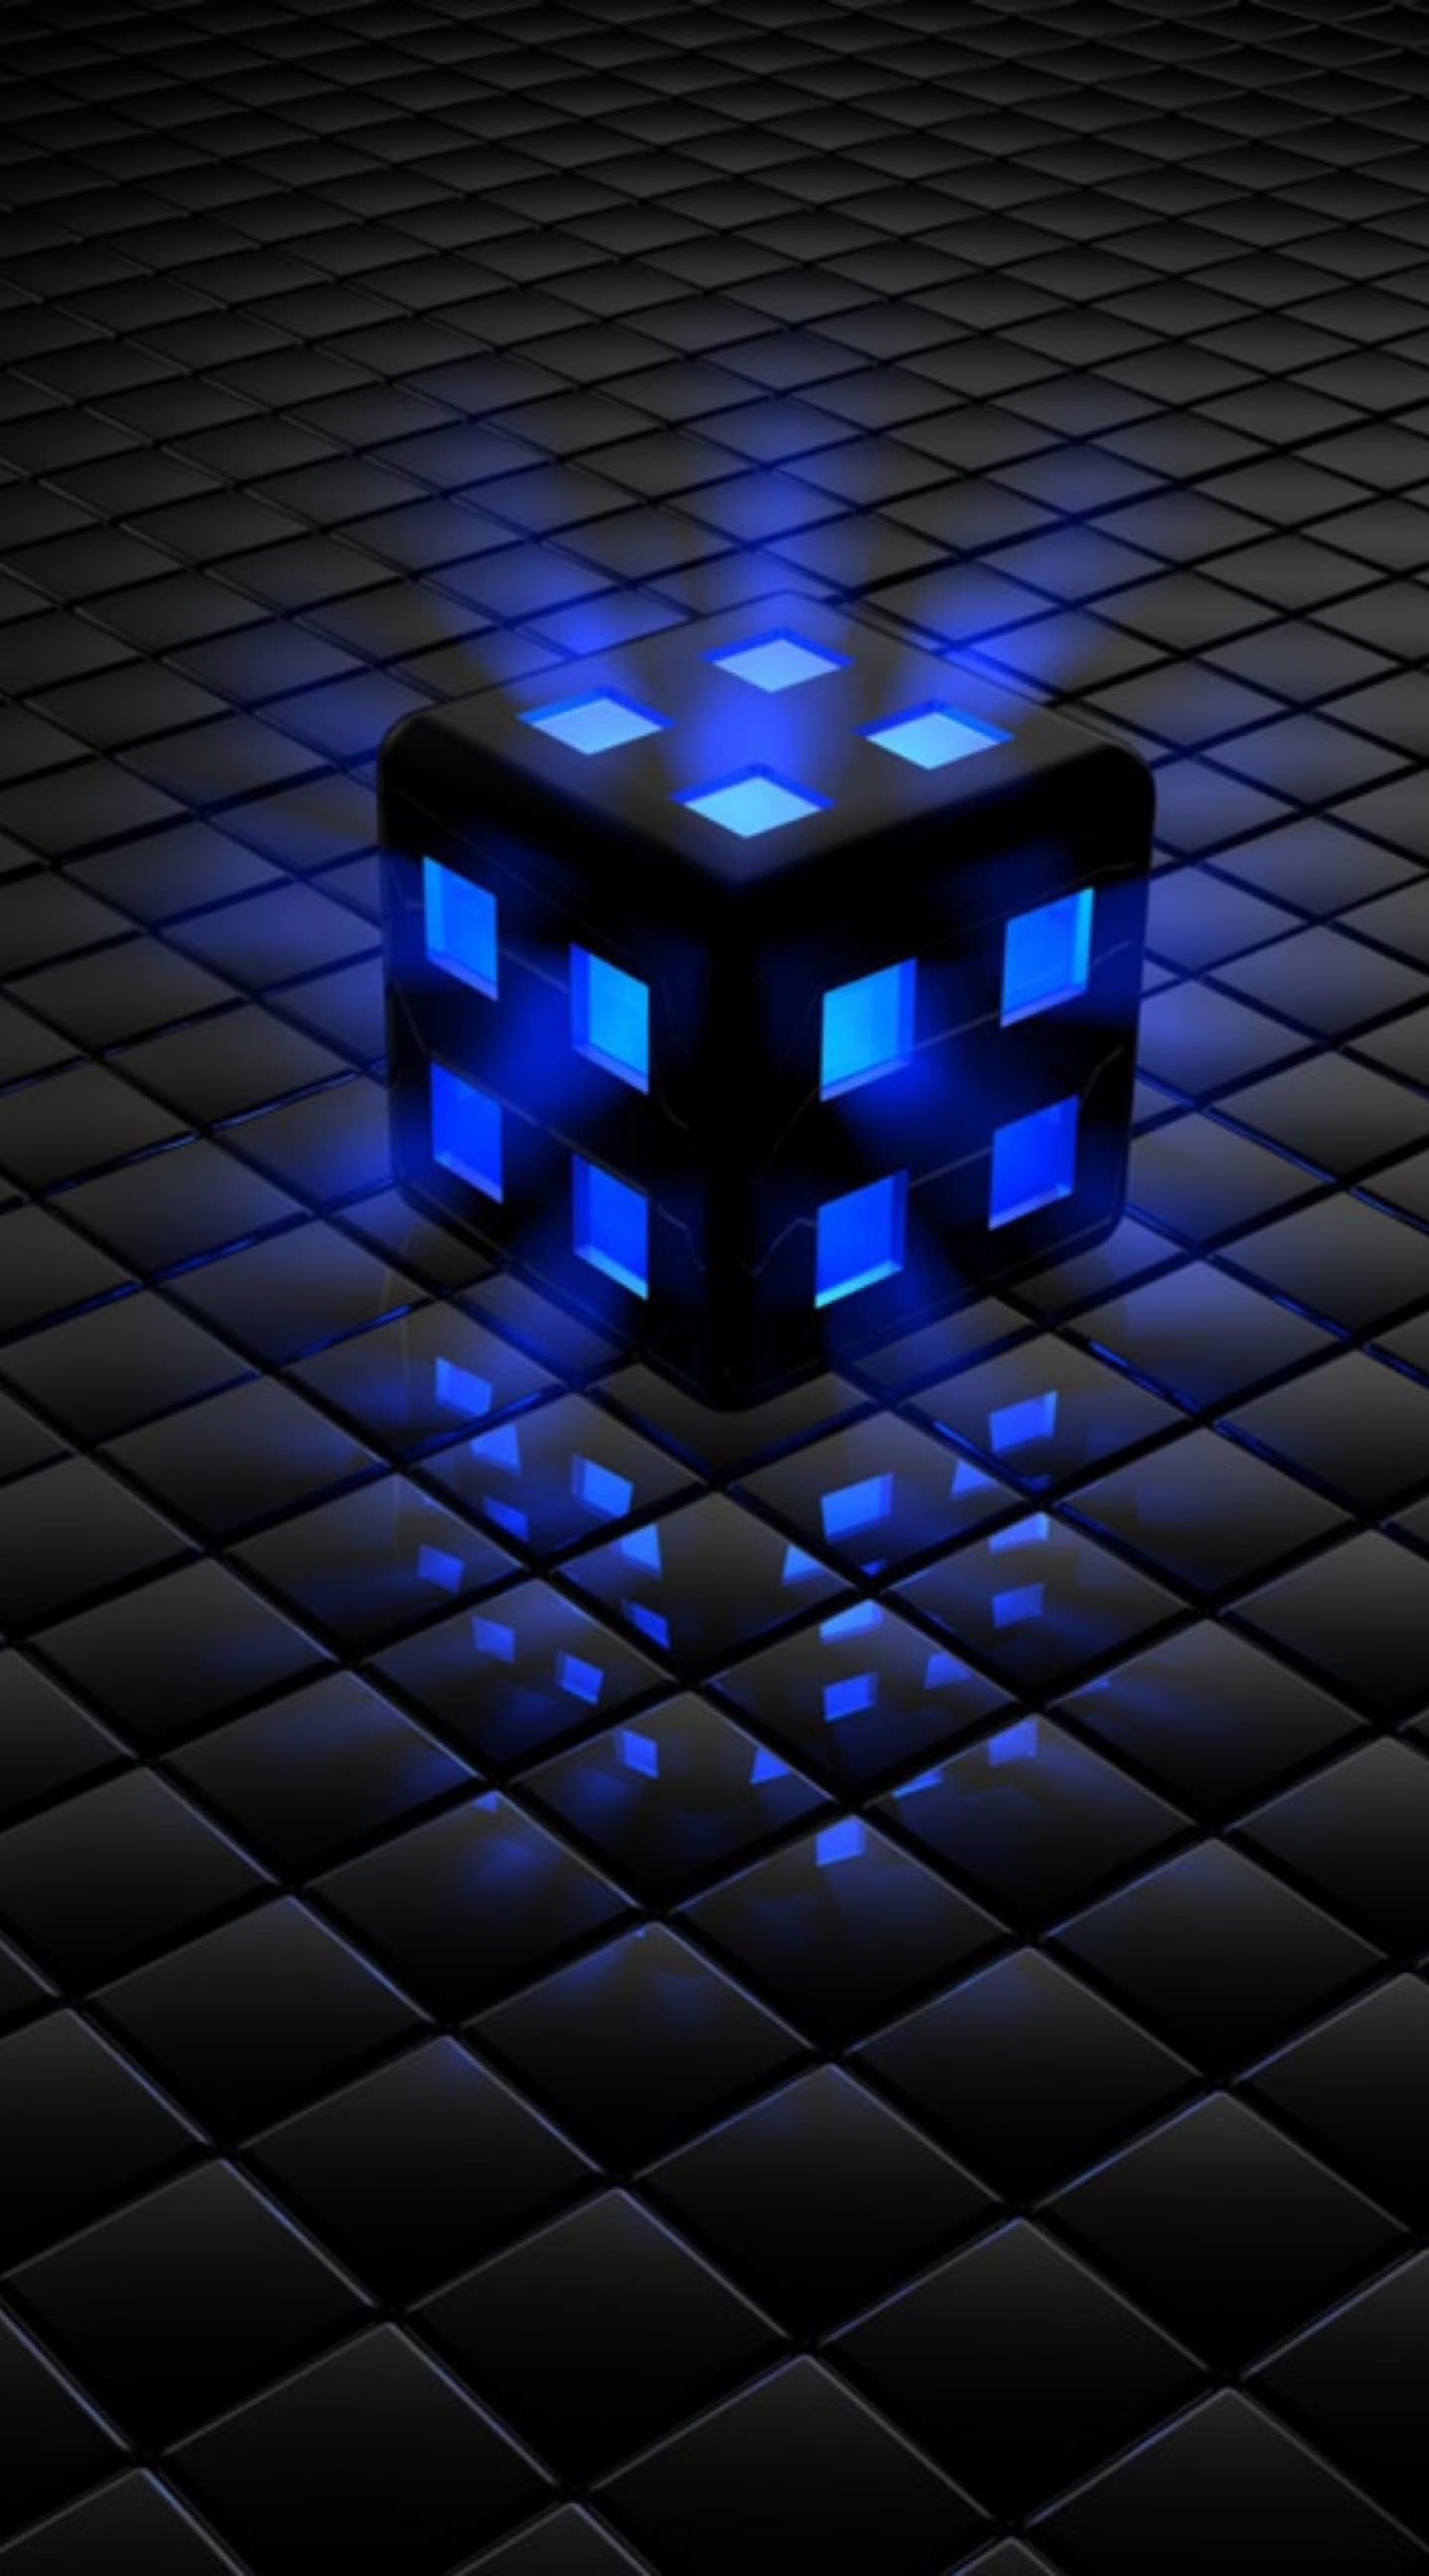 Black Blue Cool wallpapersc iPhone6Plus 1438x2592